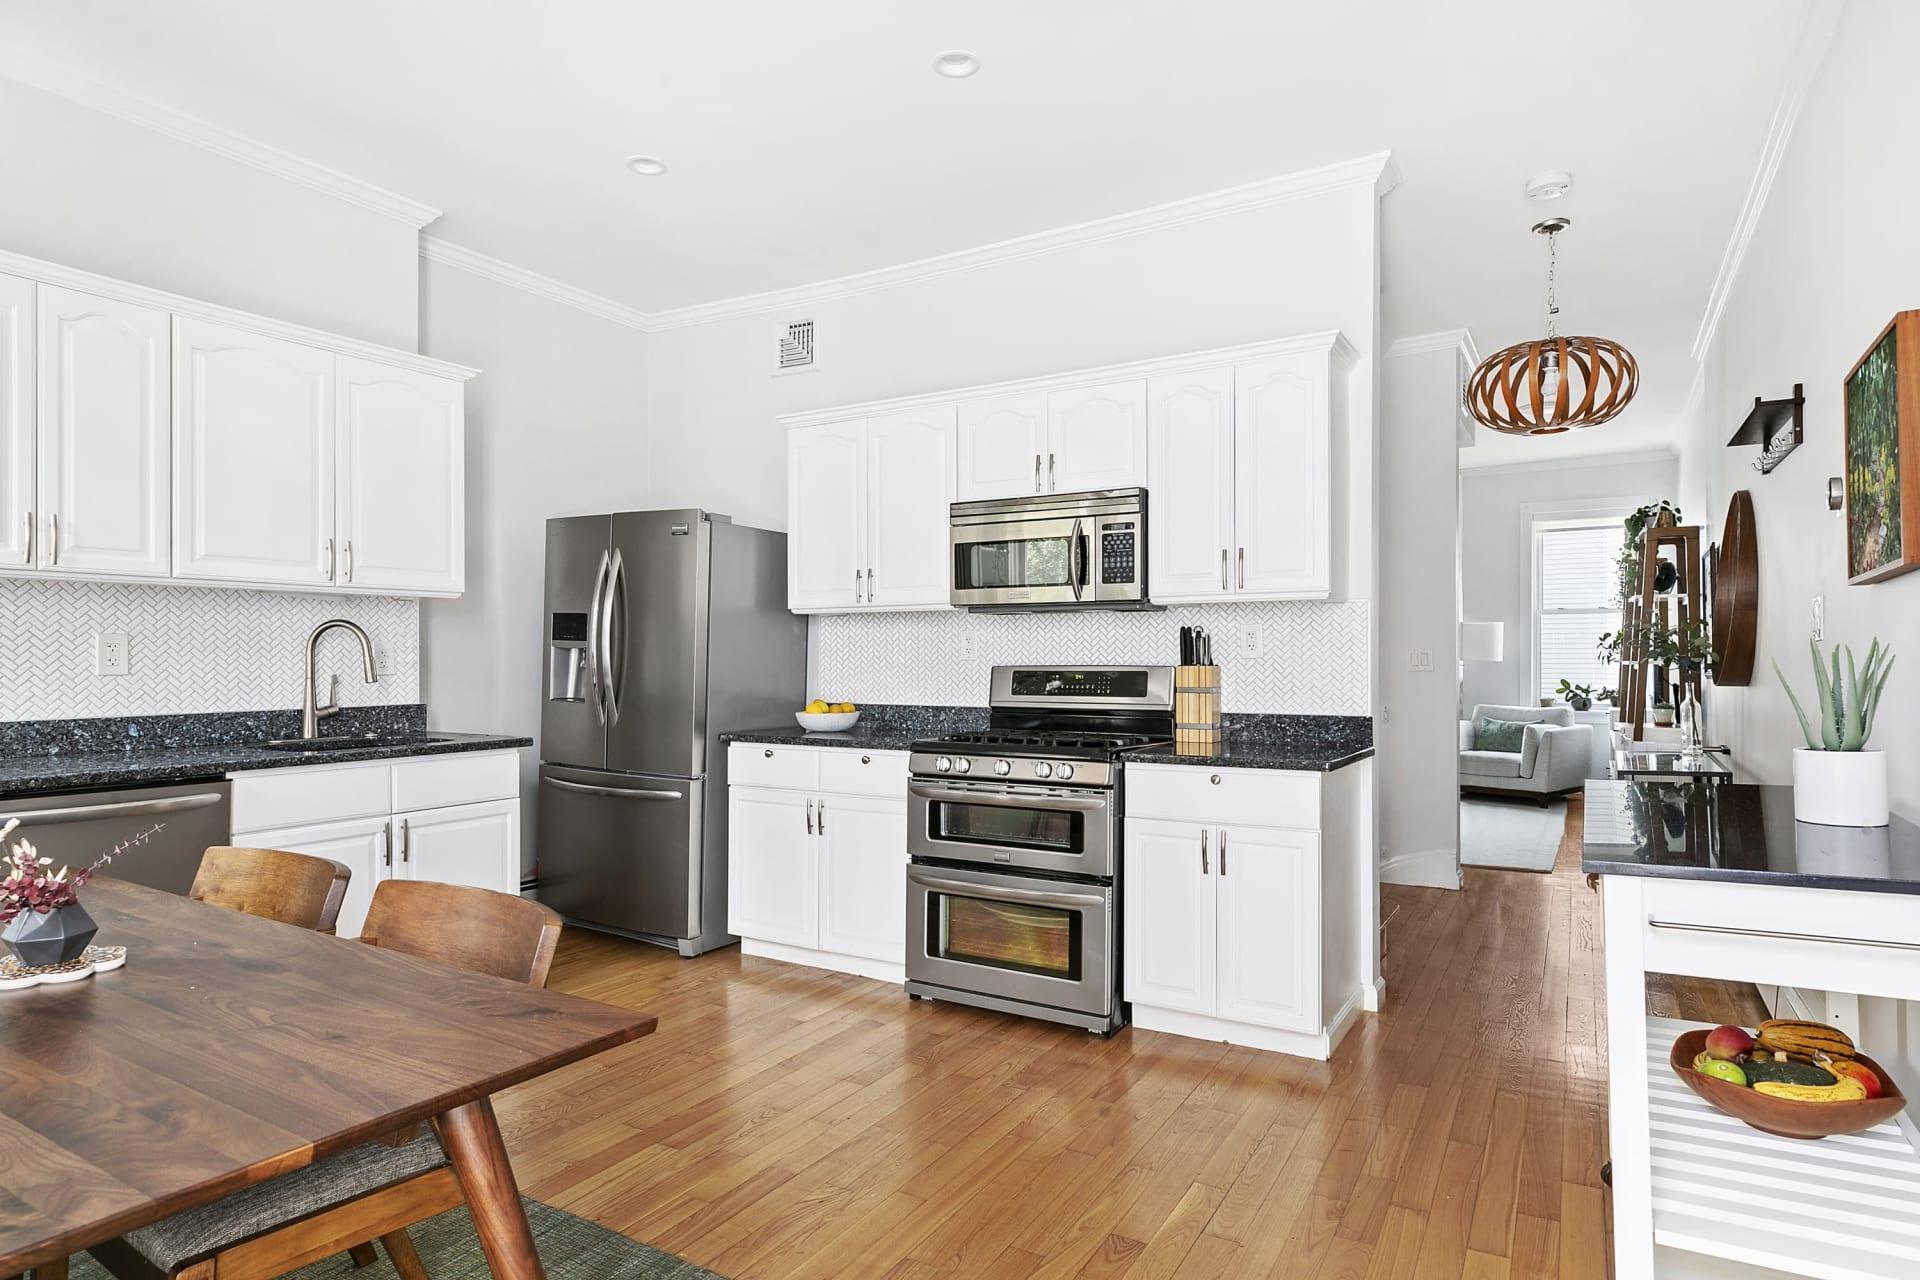 213 Green Street—Central Square top floor duplex Brownstone photo